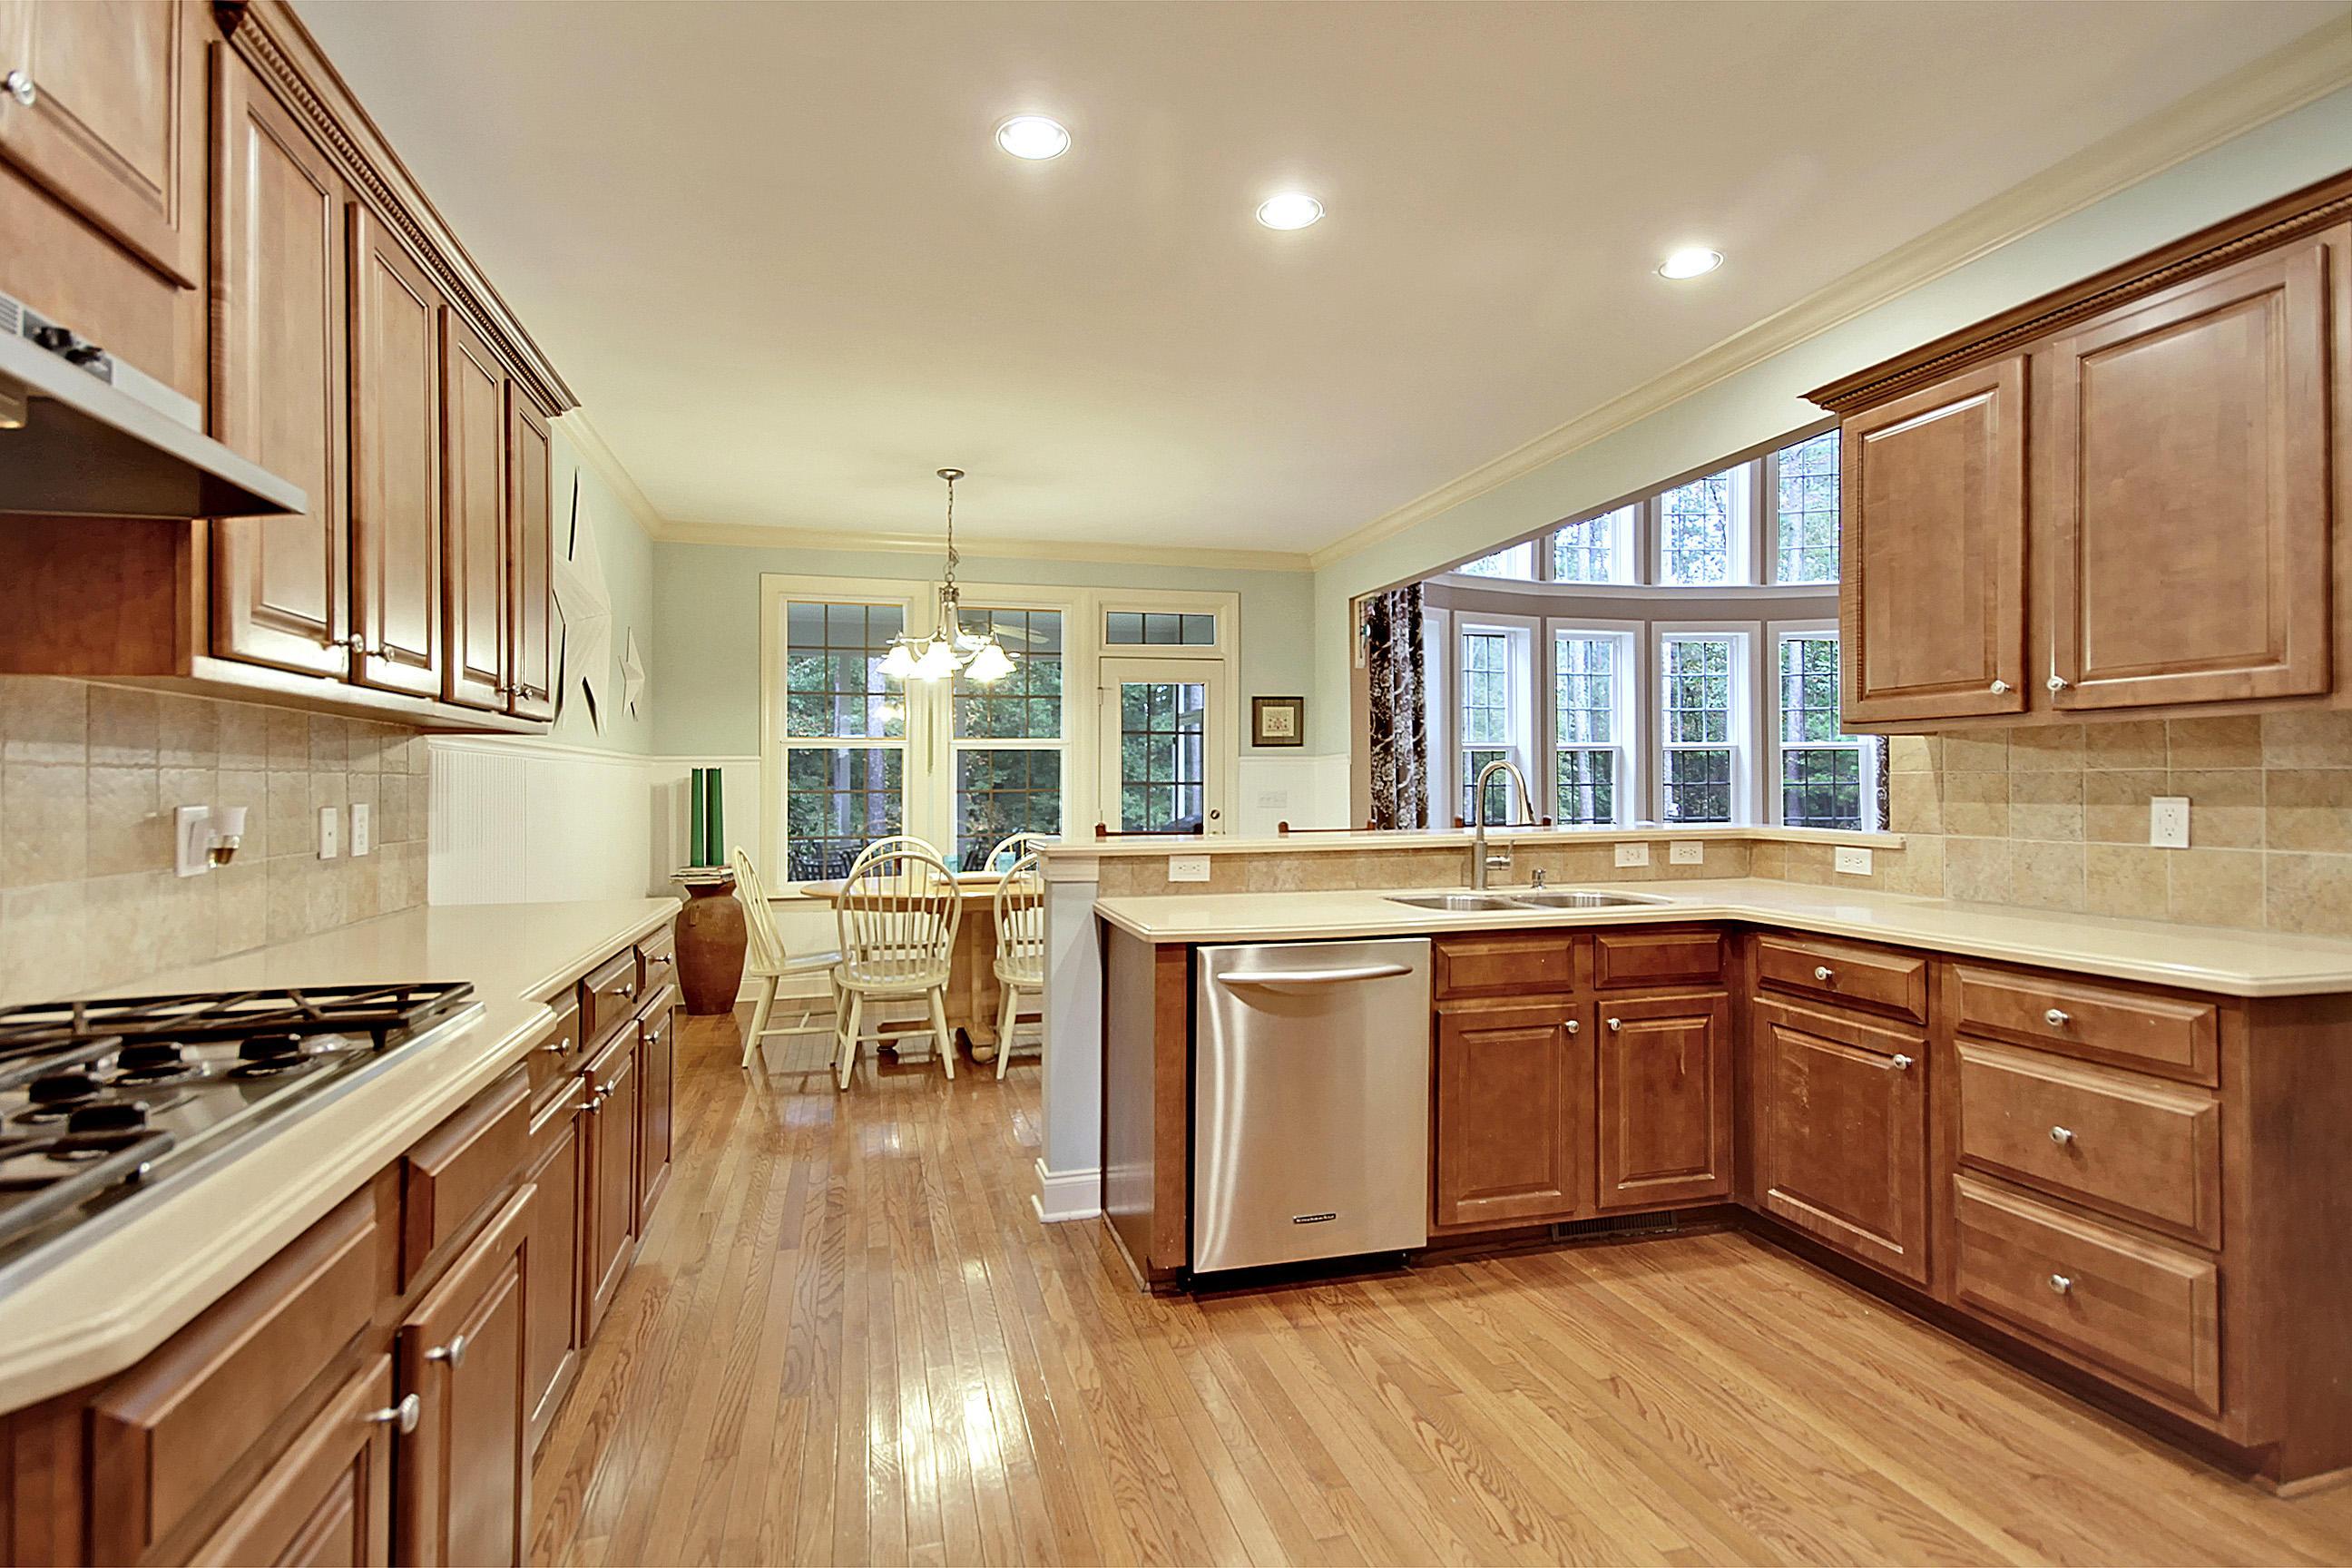 Dunes West Homes For Sale - 2449 Darts Cove, Mount Pleasant, SC - 19